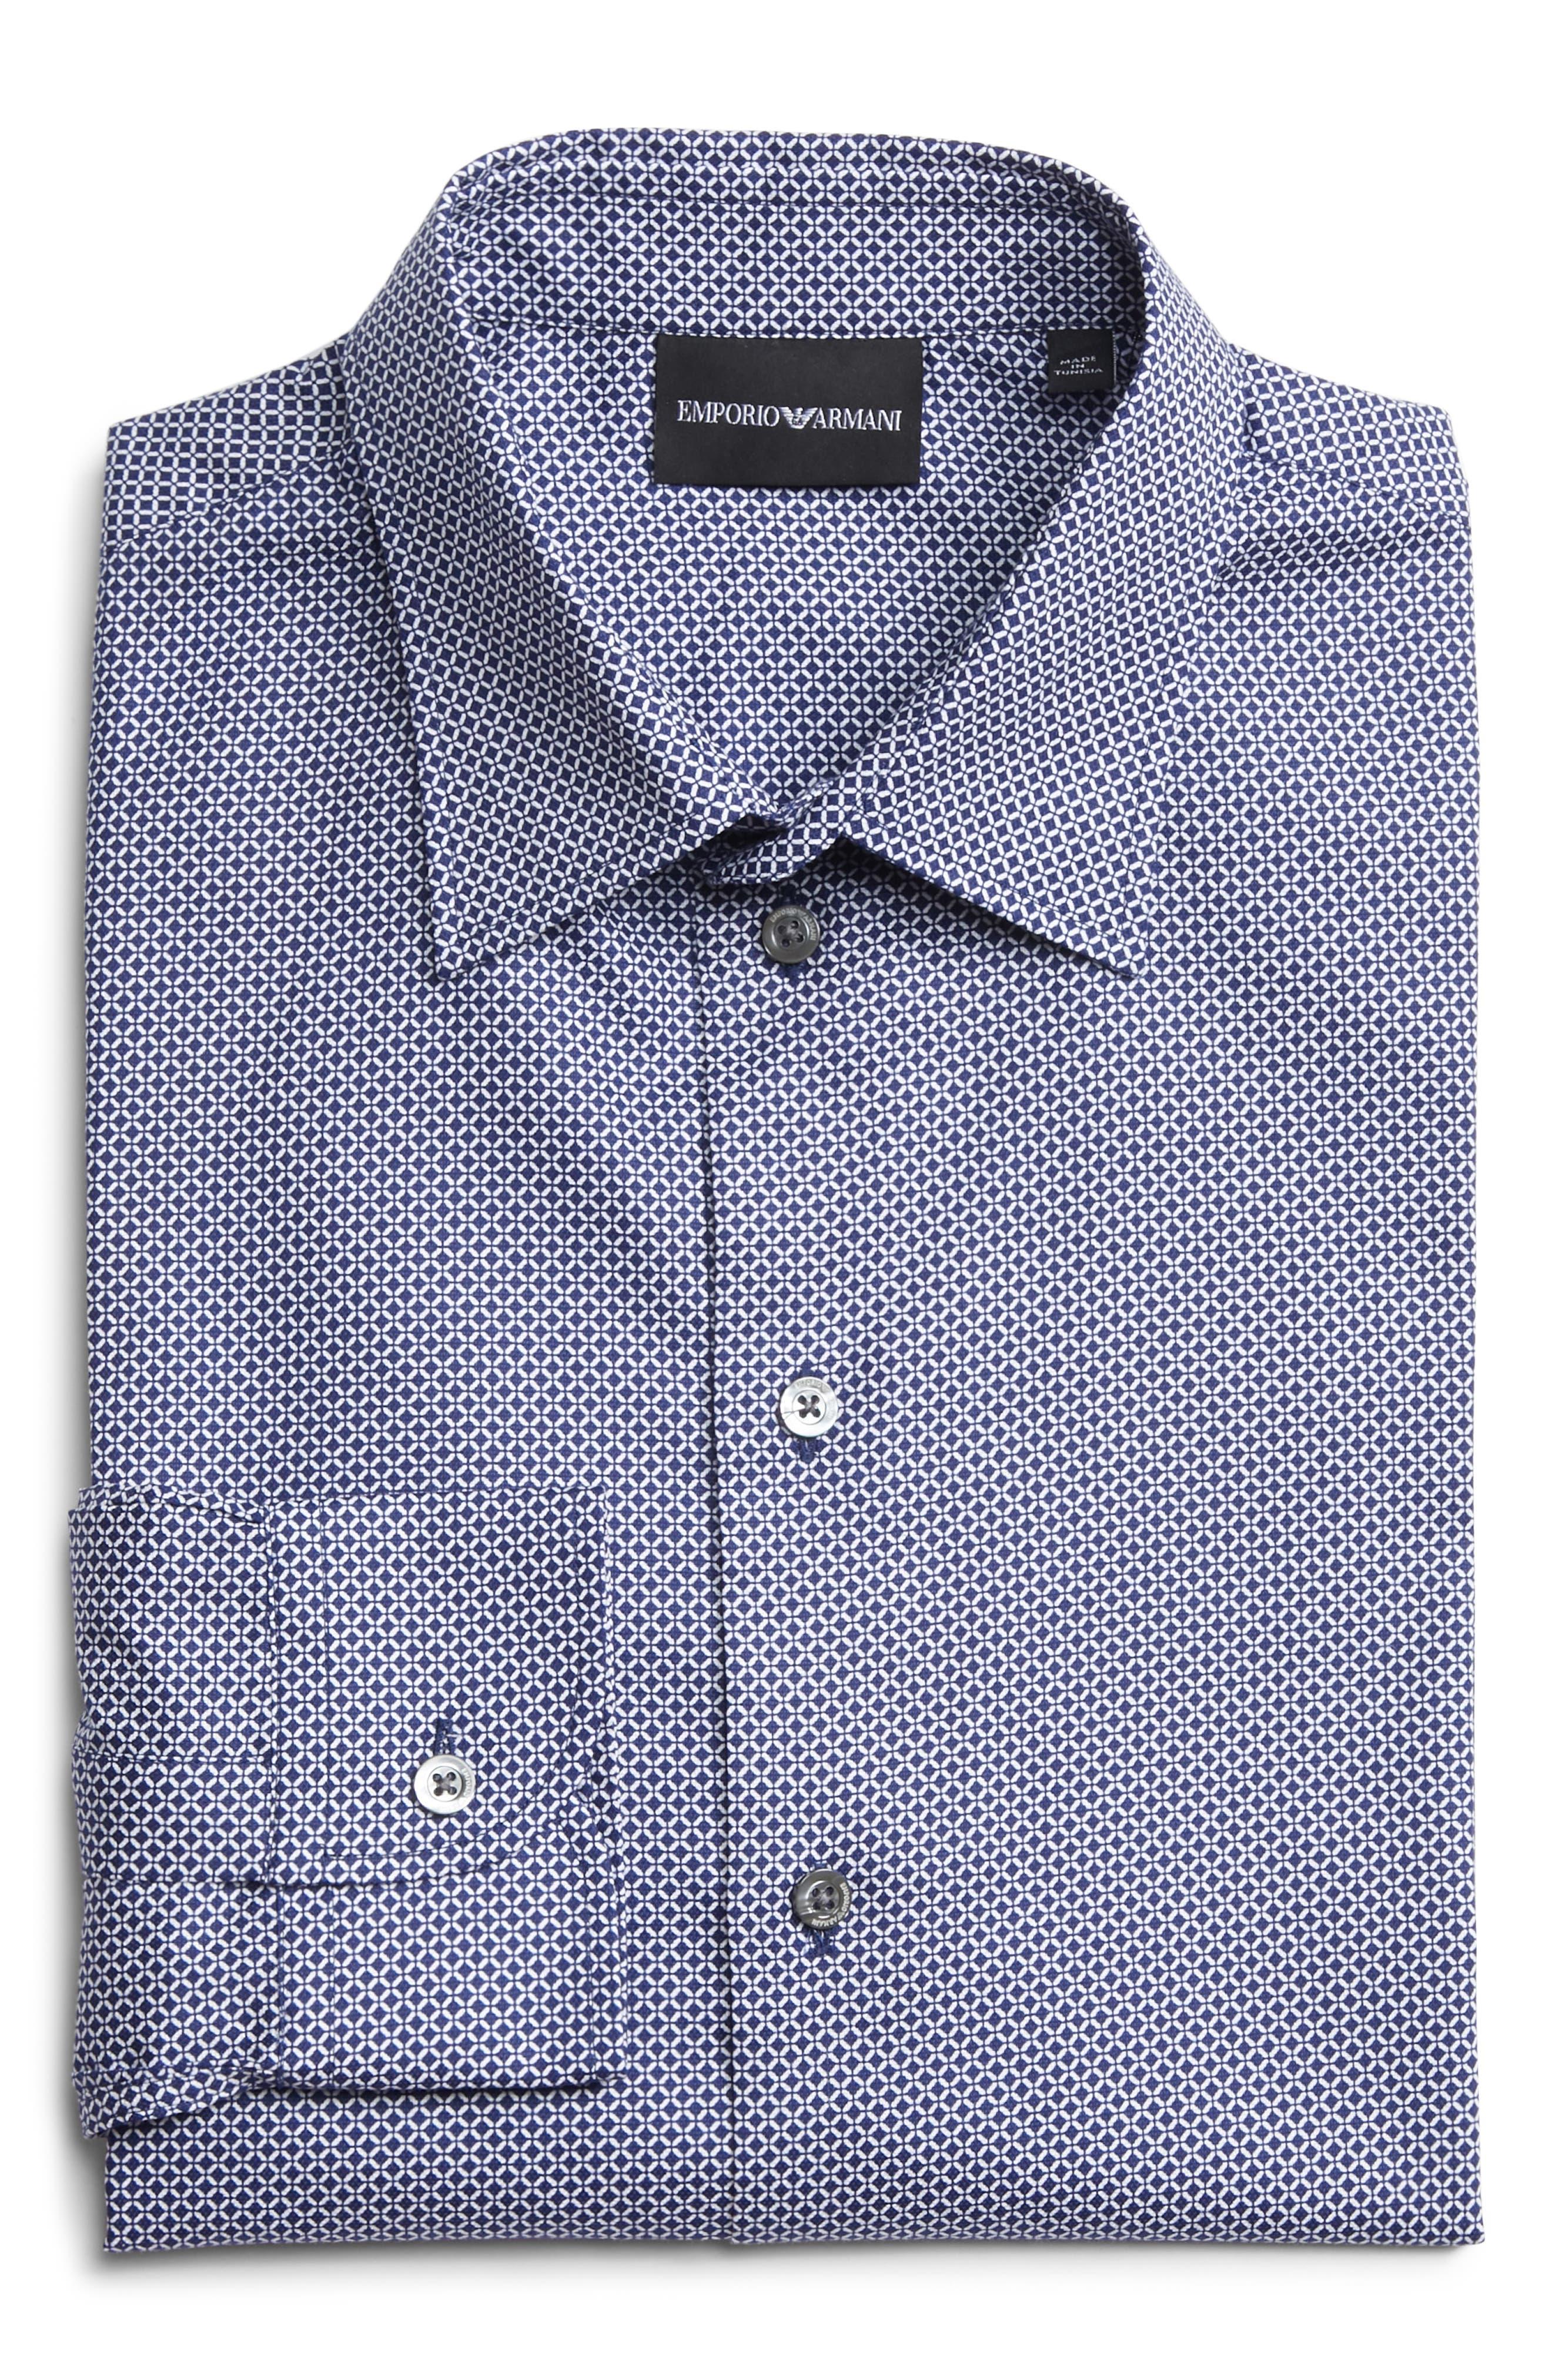 Regular Fit Sport Shirt,                             Alternate thumbnail 6, color,                             BLUE